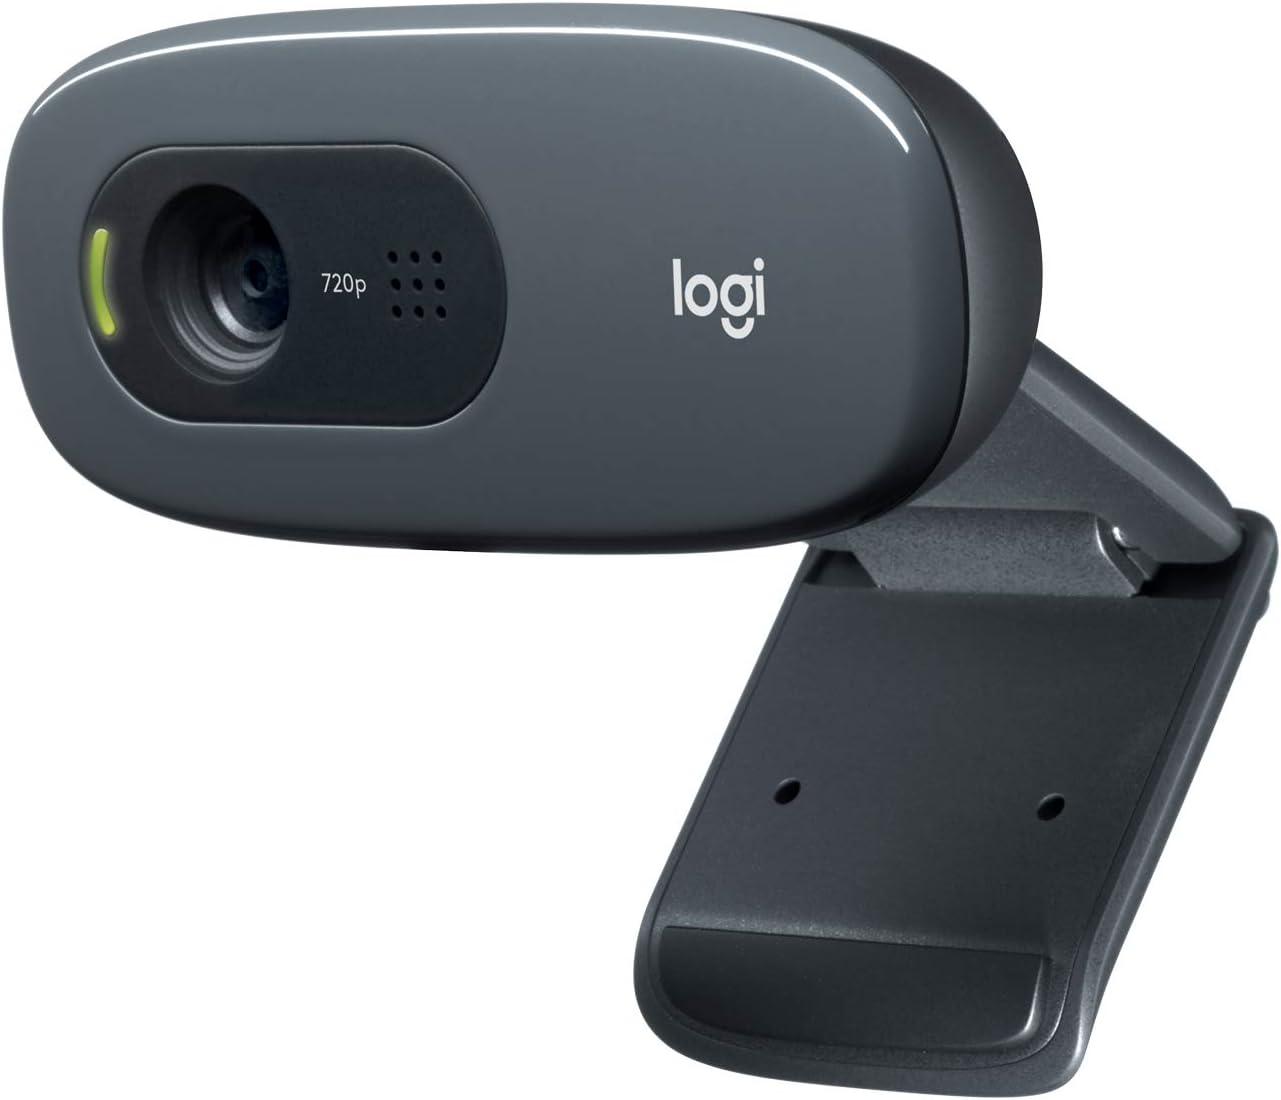 Logitech C270 Desktop or Laptop Webcam, HD 720p Widescreen for Video Calling and Recording